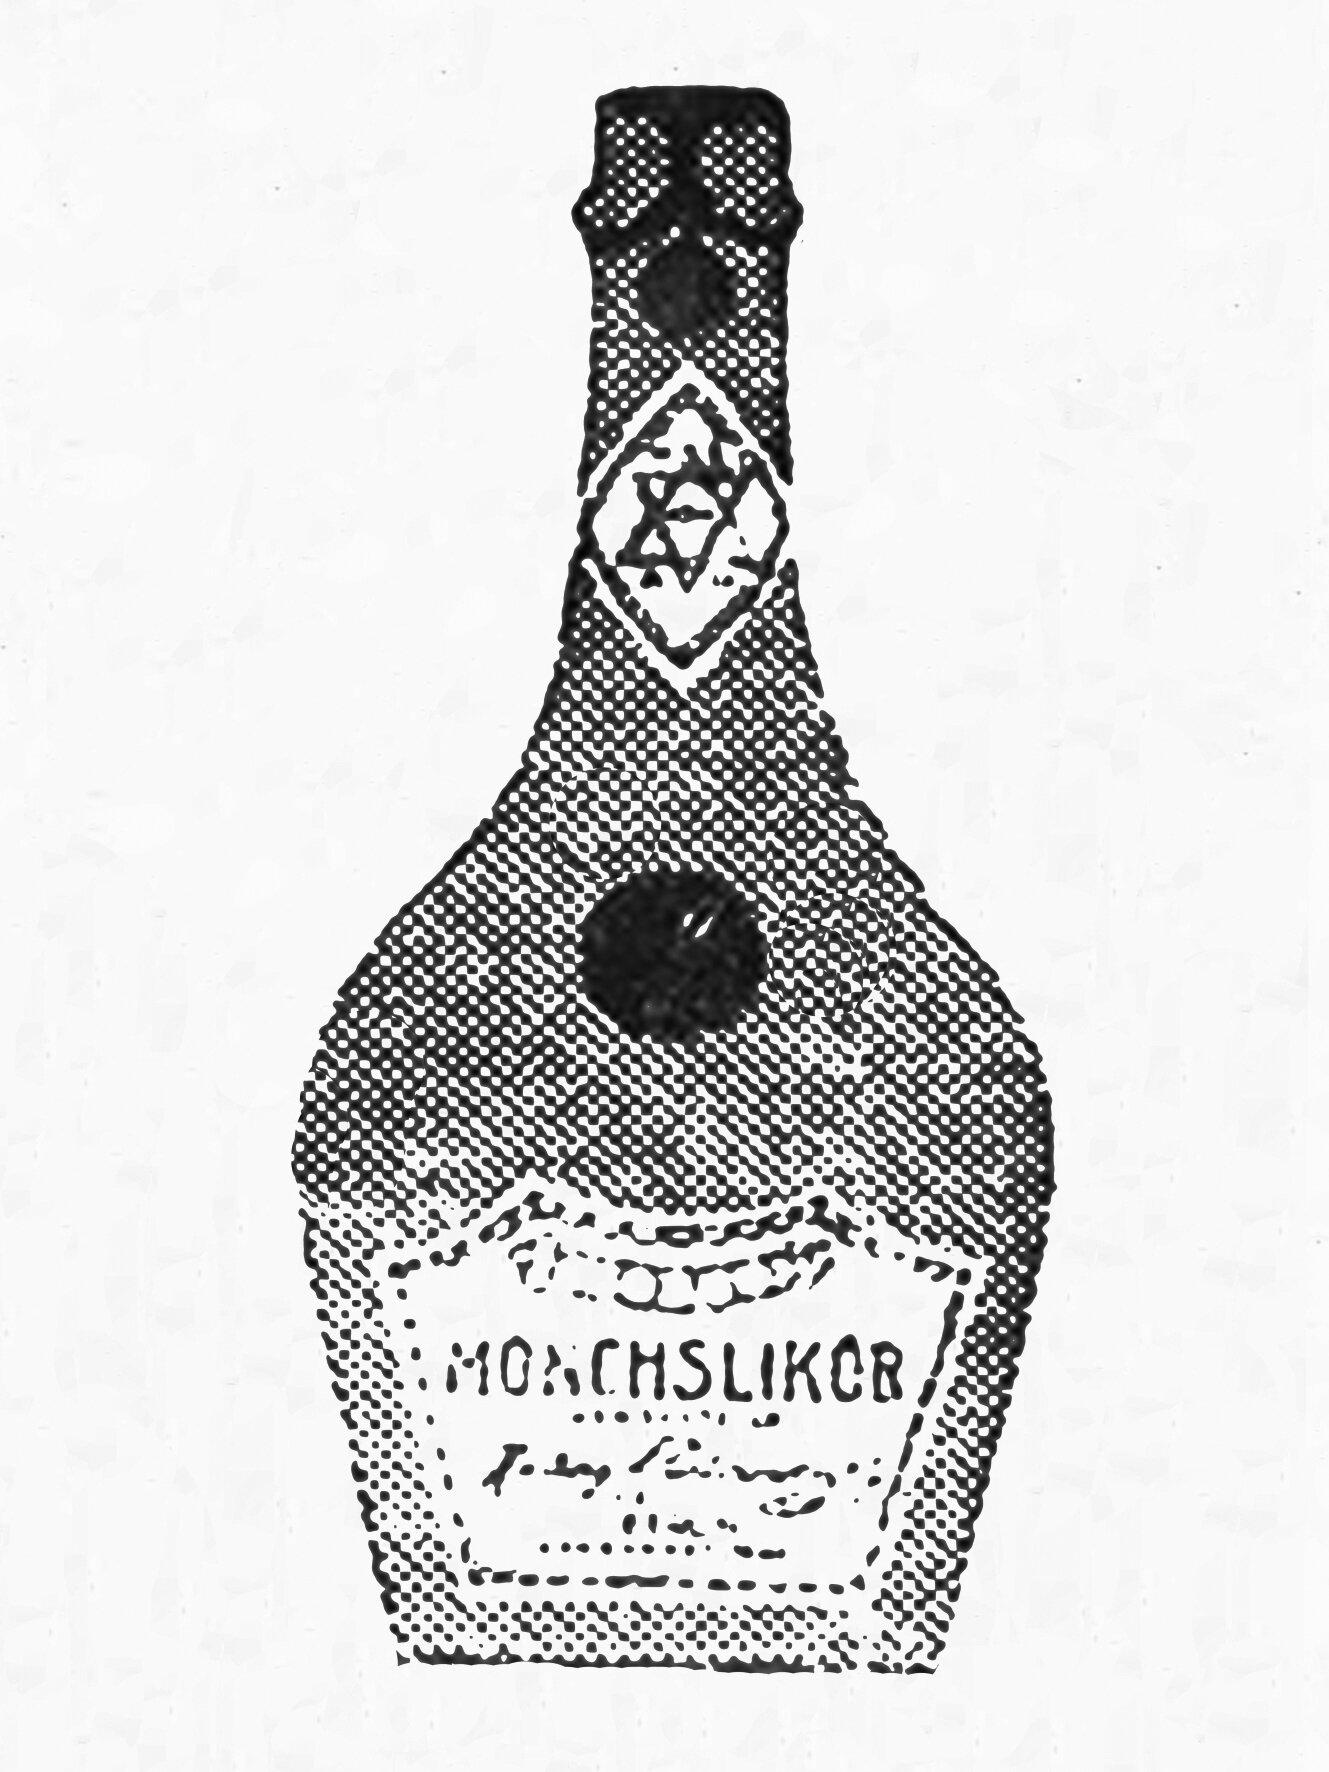 Kantorowicz Mönchslikör, © Gerhard Schneider, Leipzig